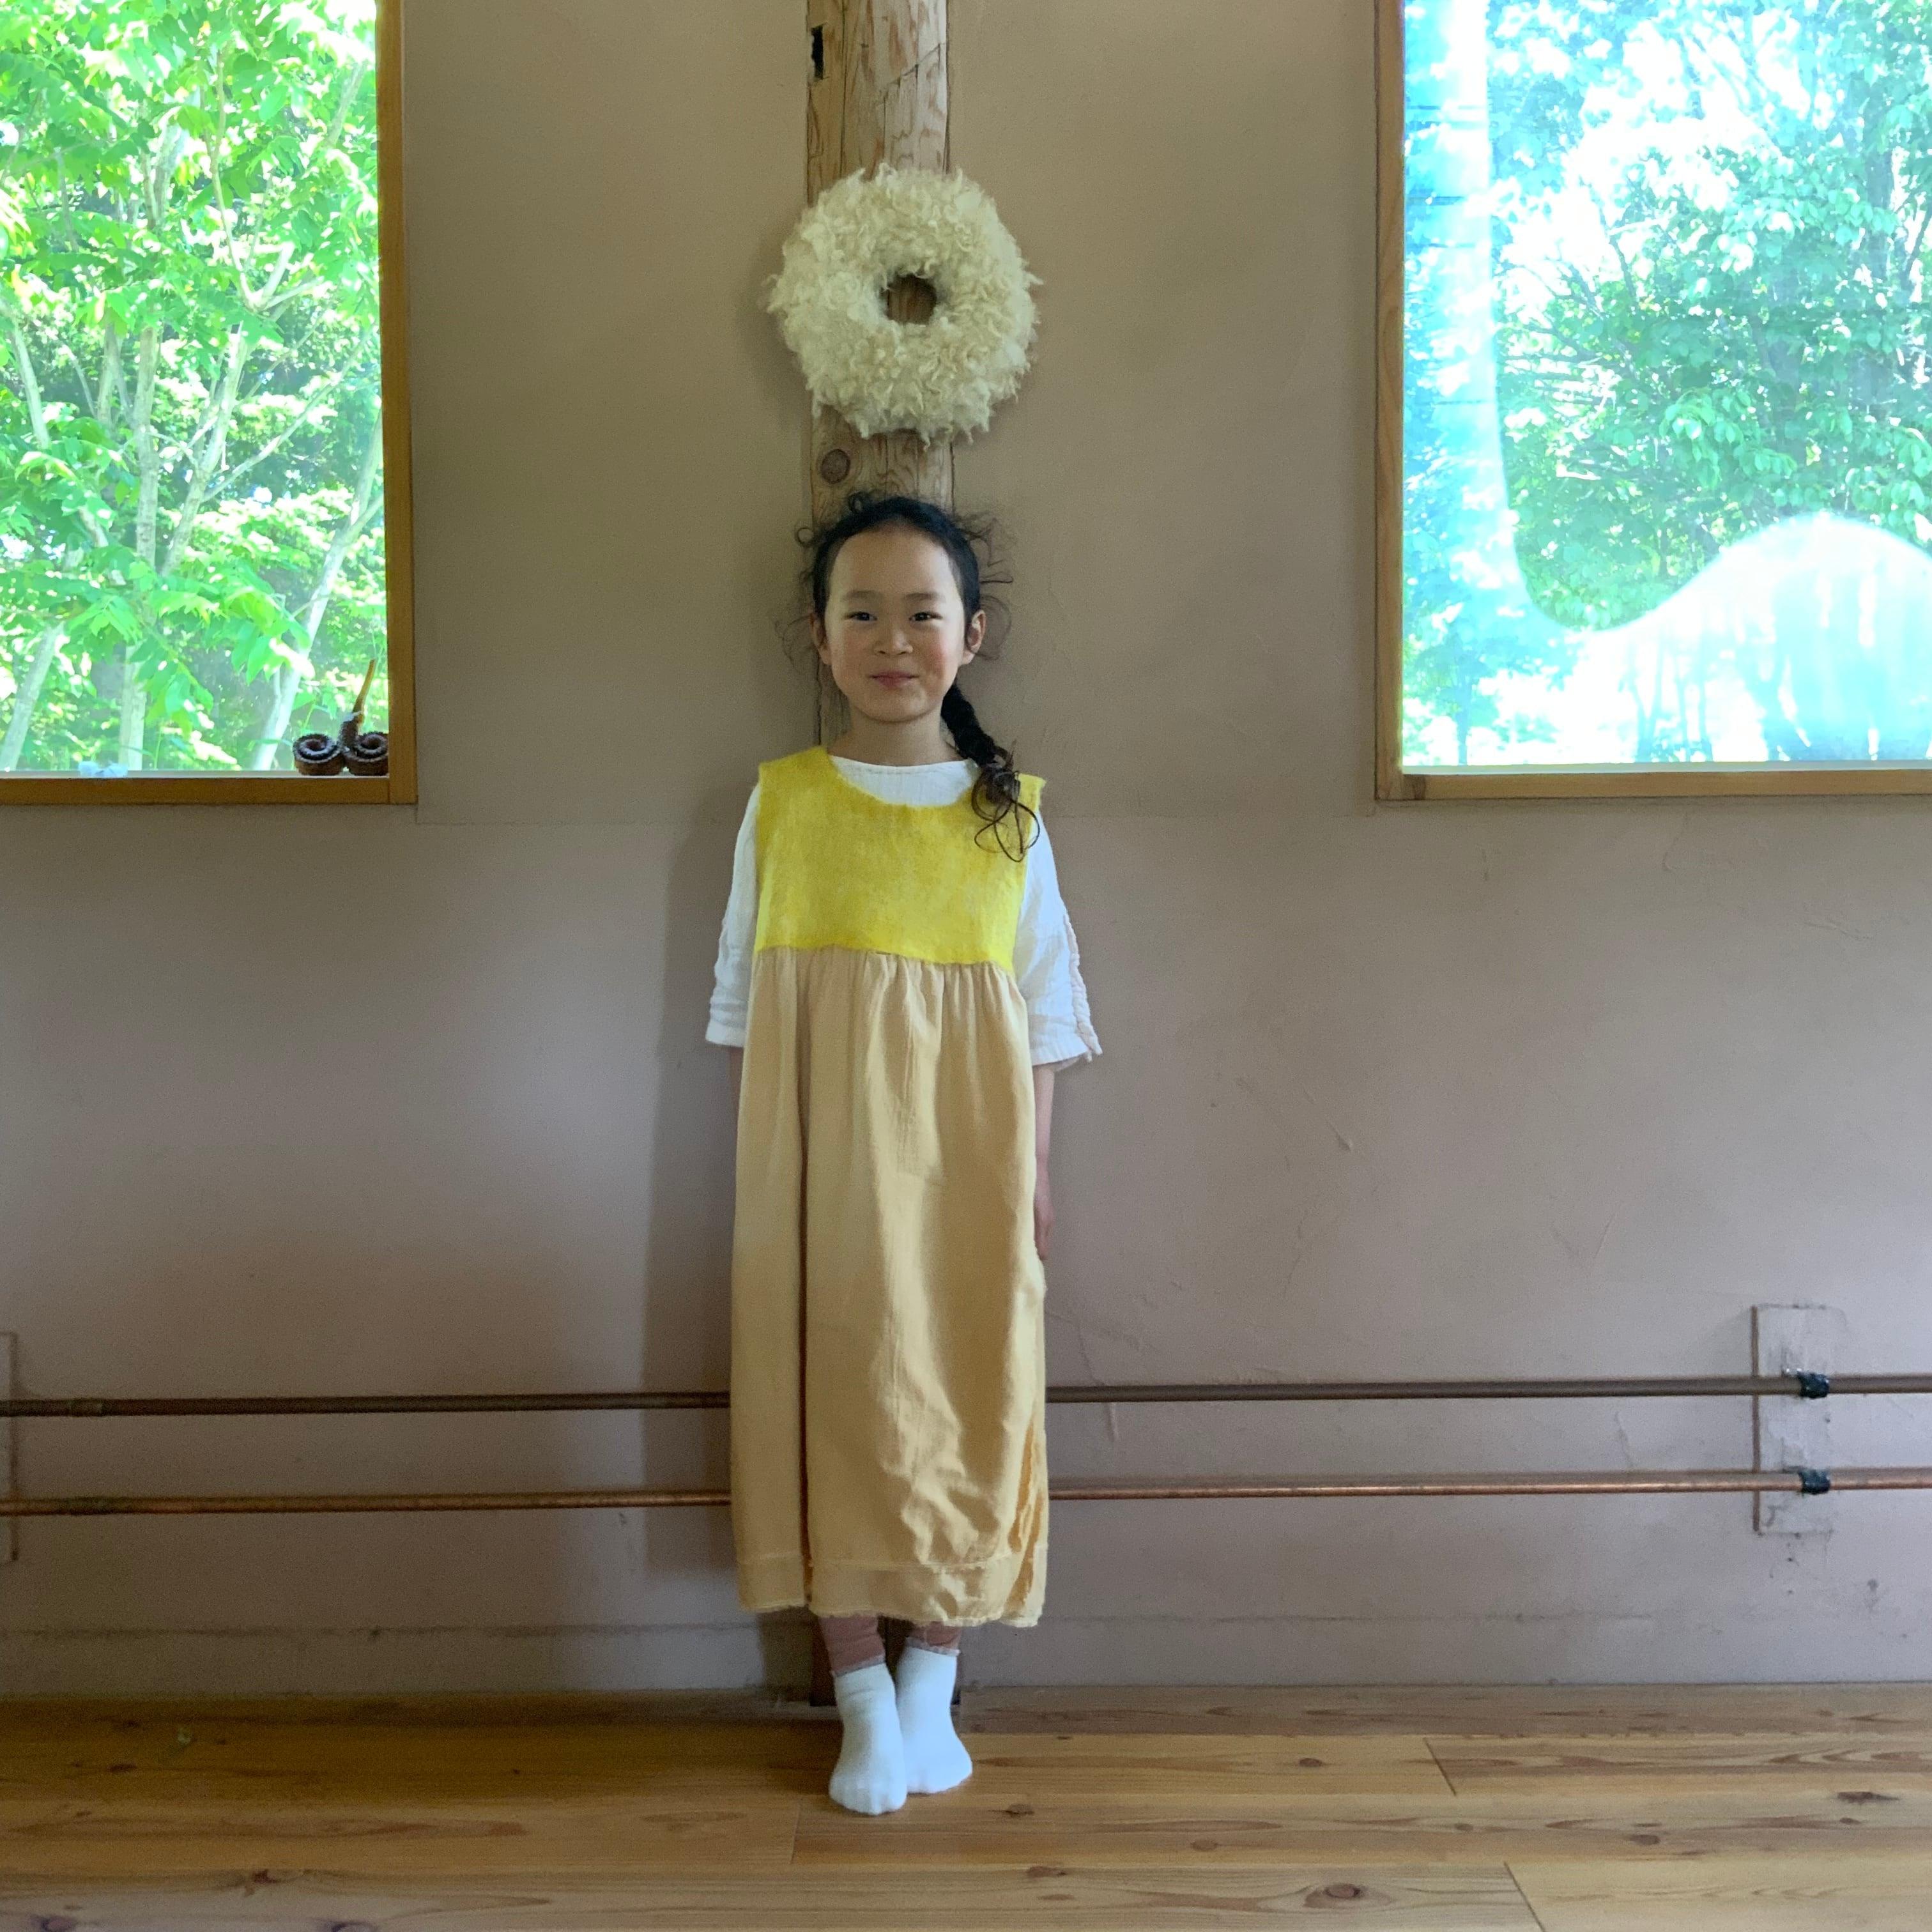 OPCLKL2-21002 ワンピースコリーヌ キッズ ロング丈 黄色